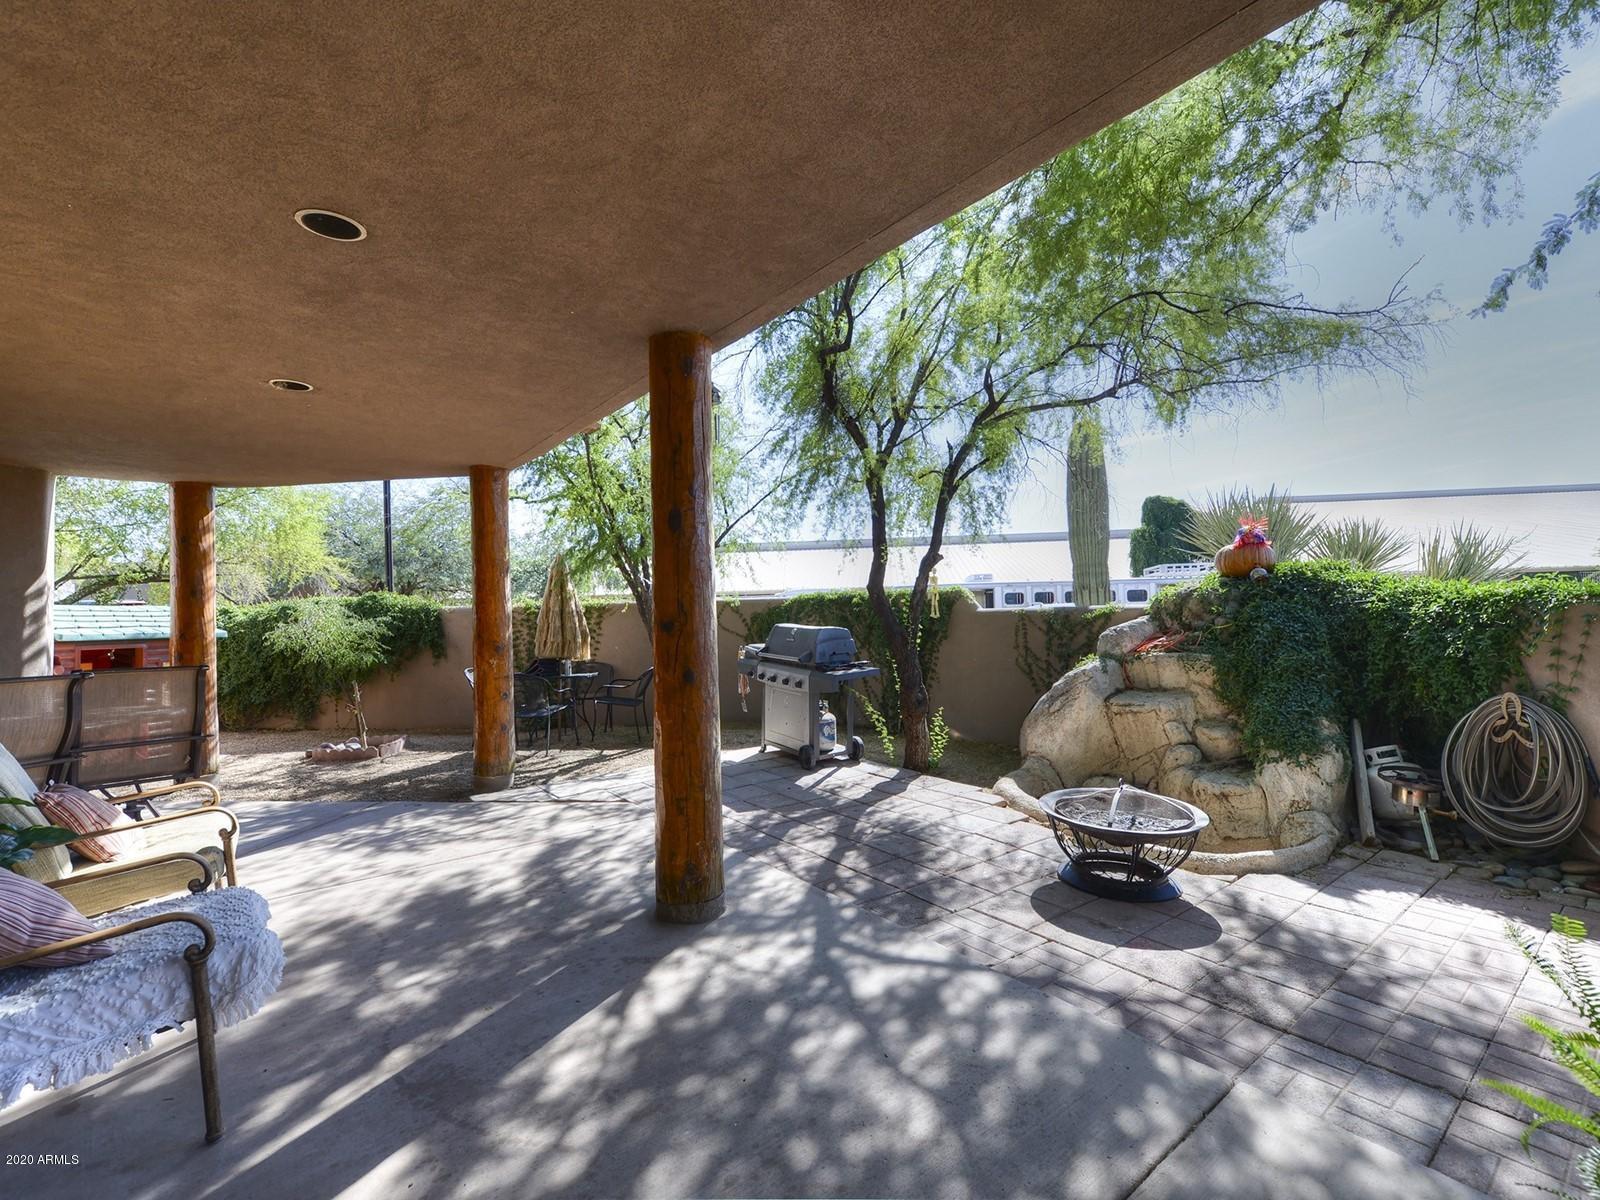 8510 E Dynamite Blvd Scottsdale, AZ